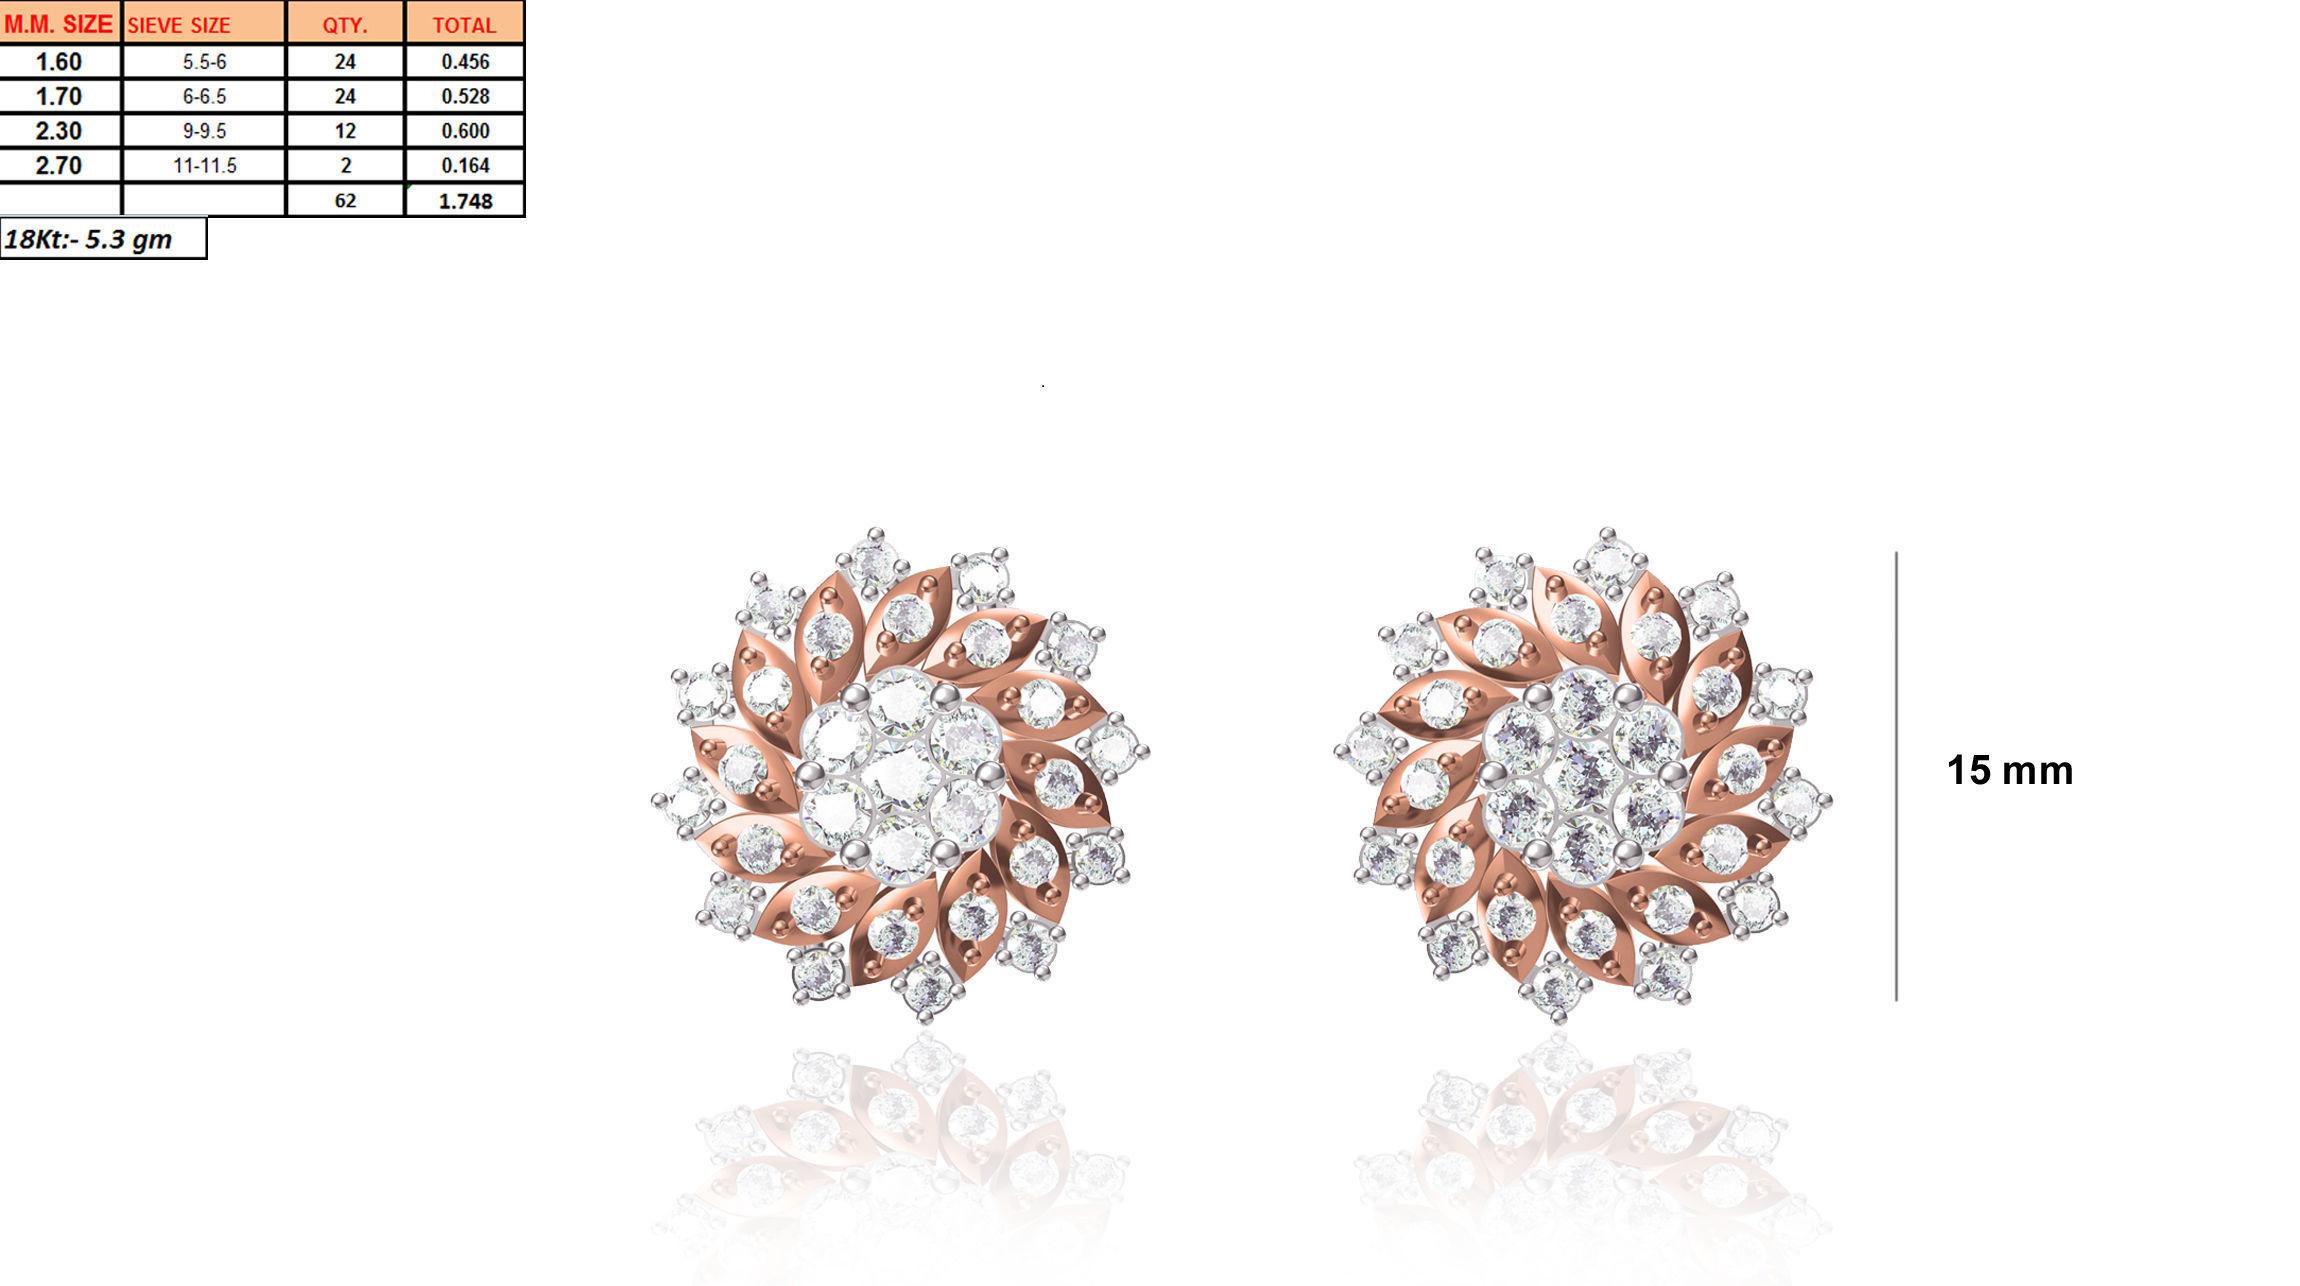 Flower Shaped Earrings With Diamonds 10 Print Model